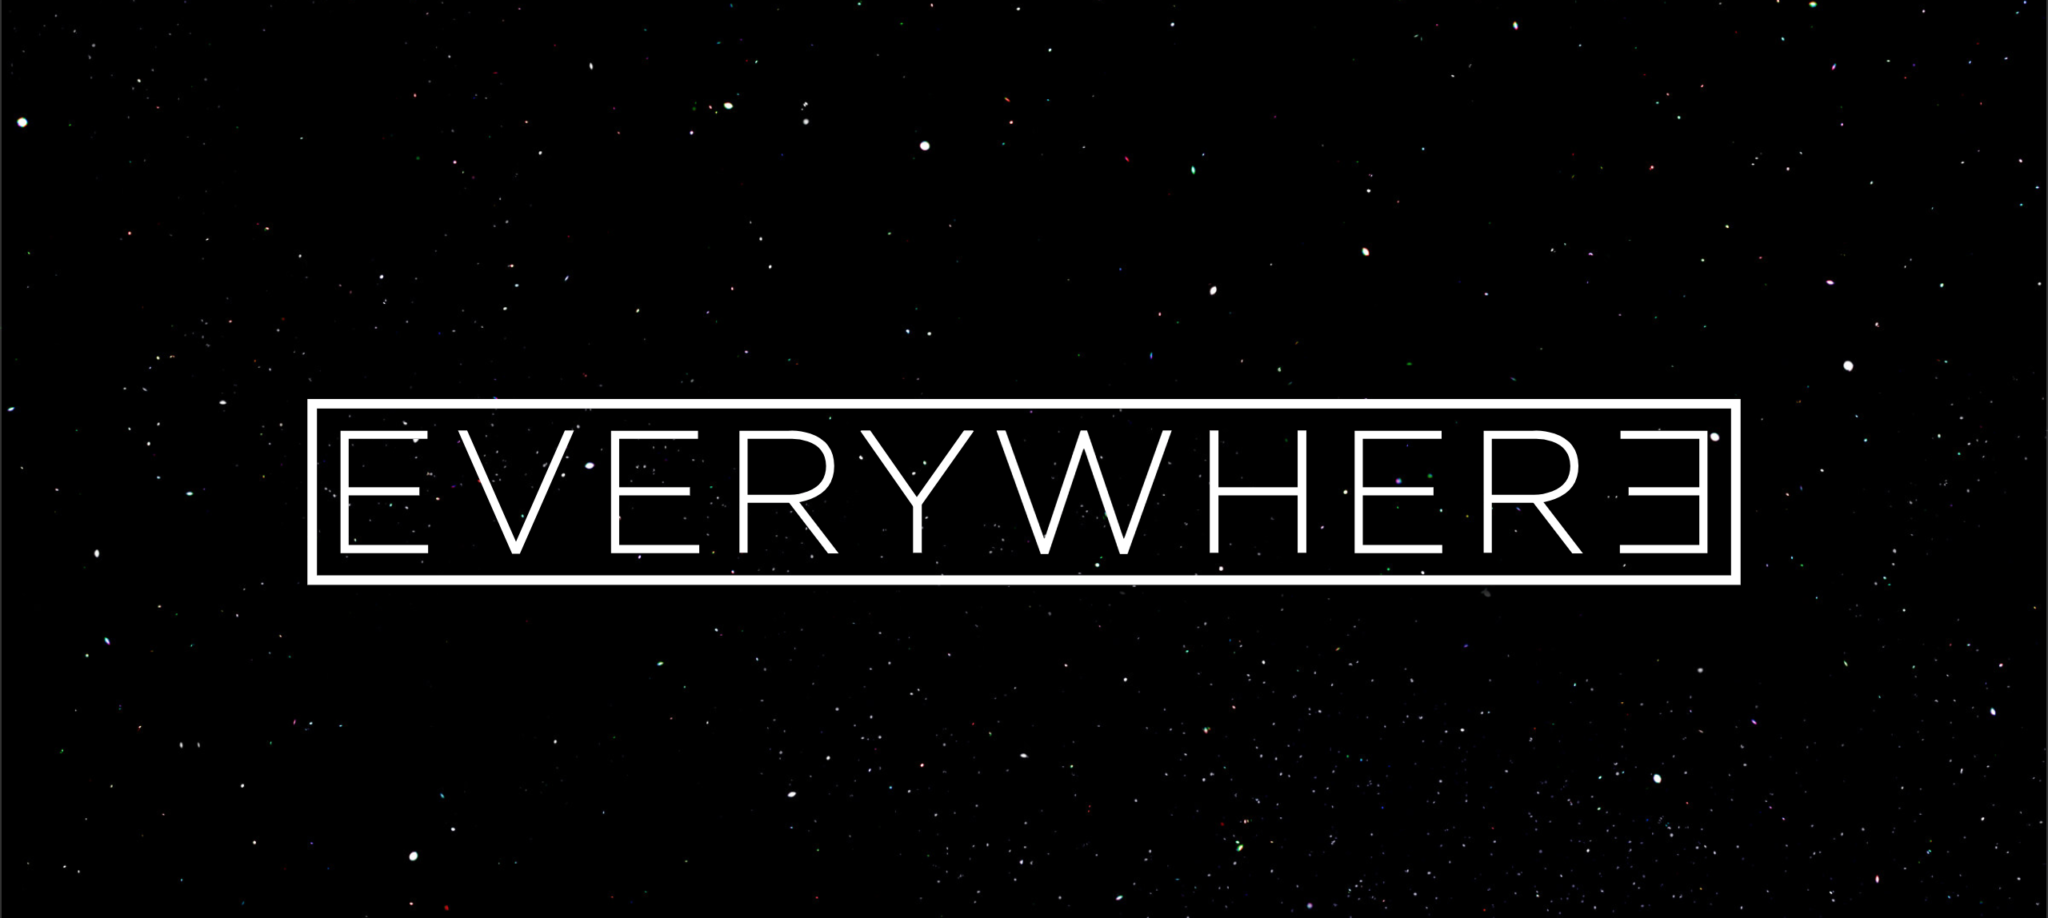 Everywhere video game logo